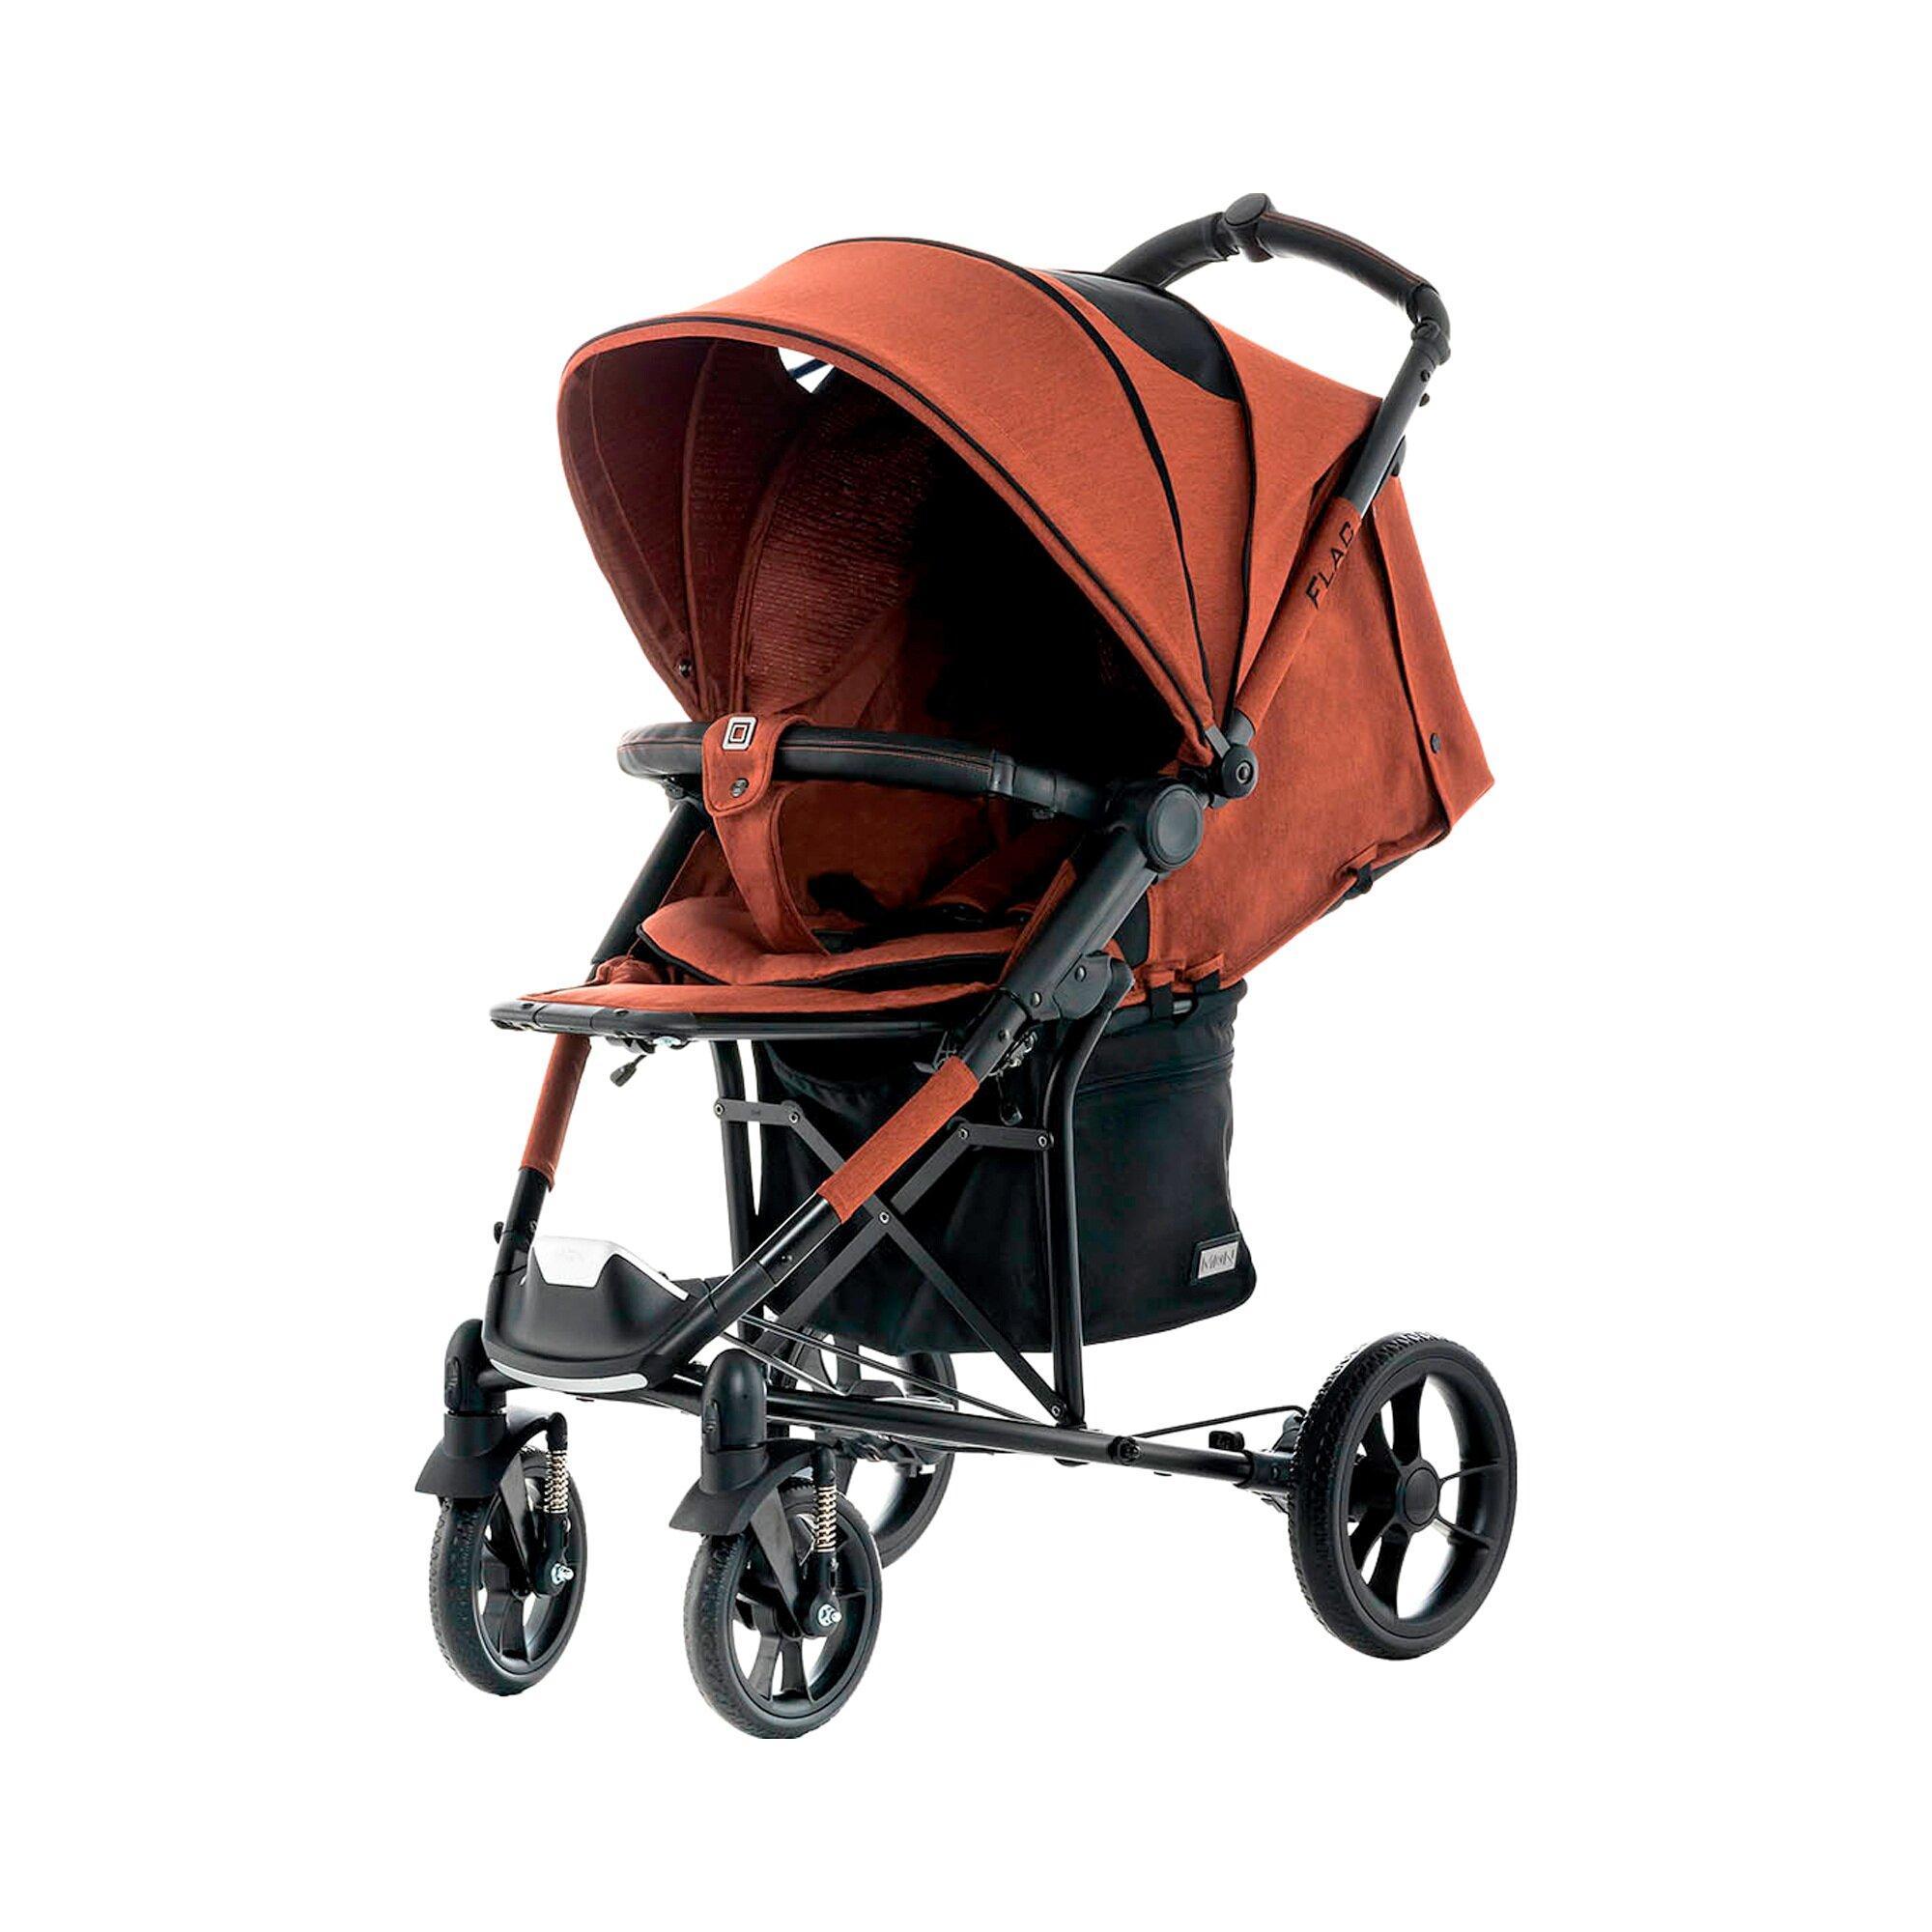 moon-buggy-flac-design-2018-orange